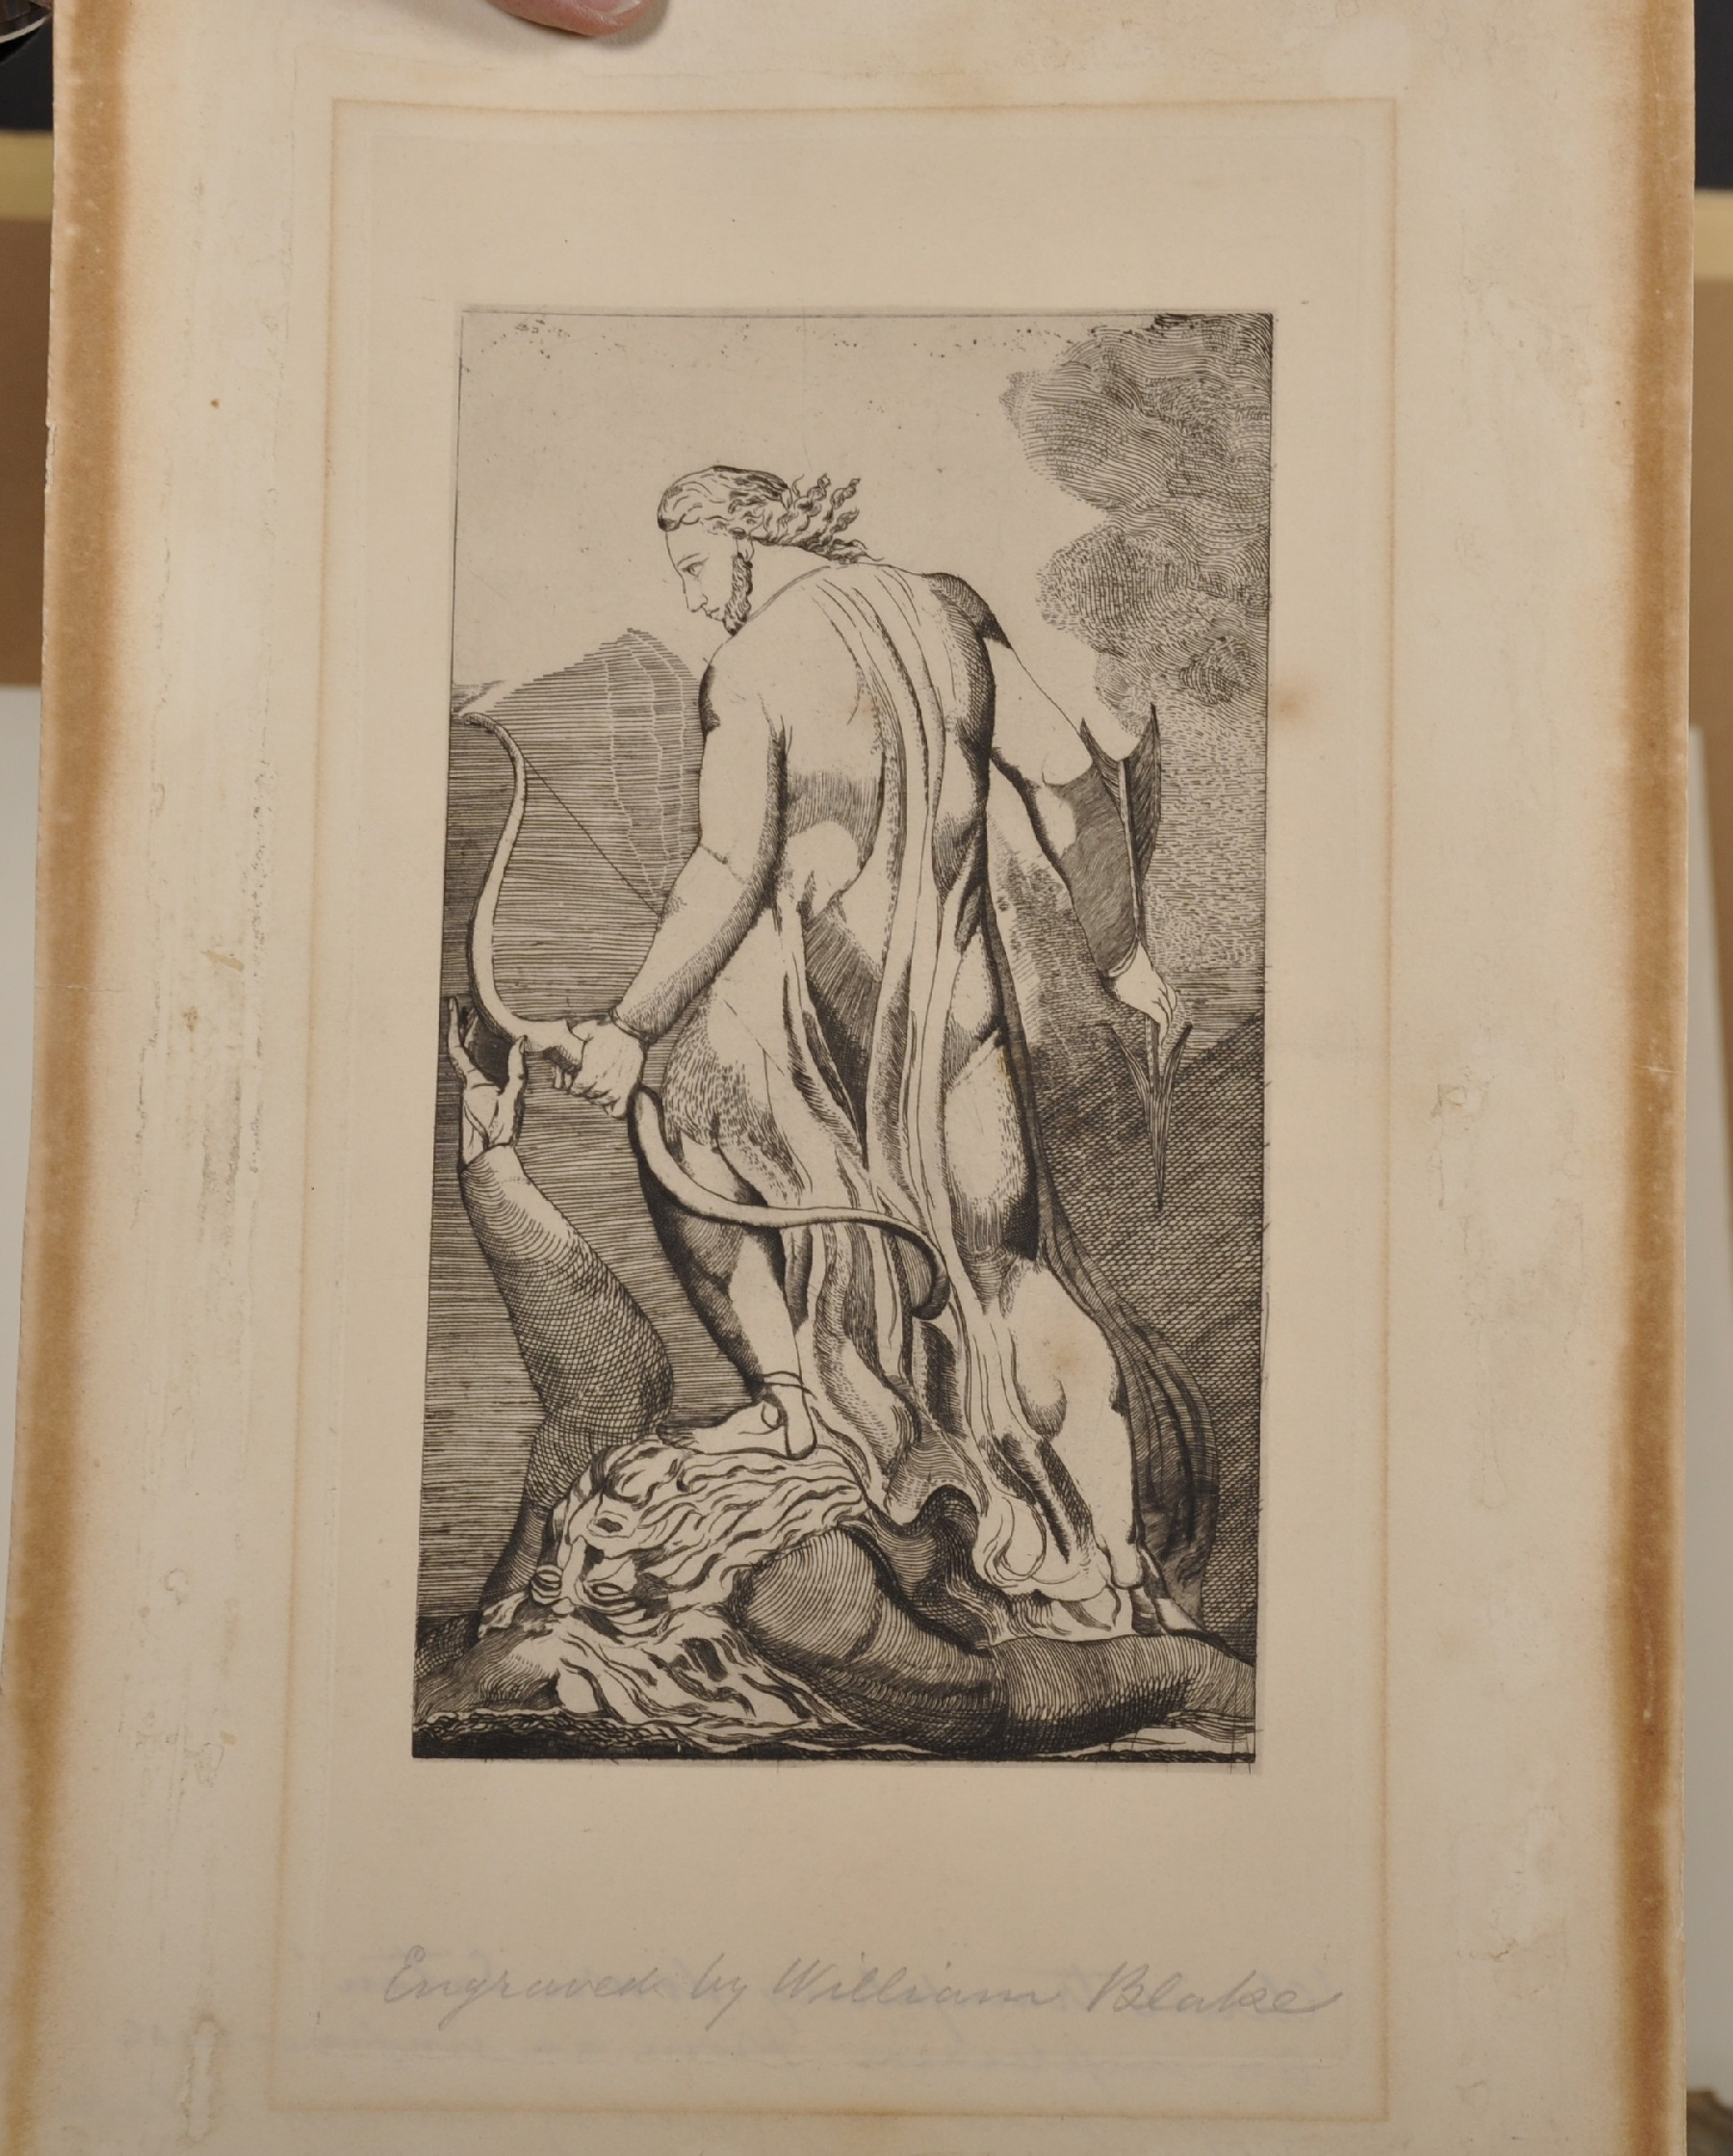 "After William Blake (1757-1827) British. ""Christ Trampling on Satan"", Engraving, Inscribed in - Image 2 of 3"